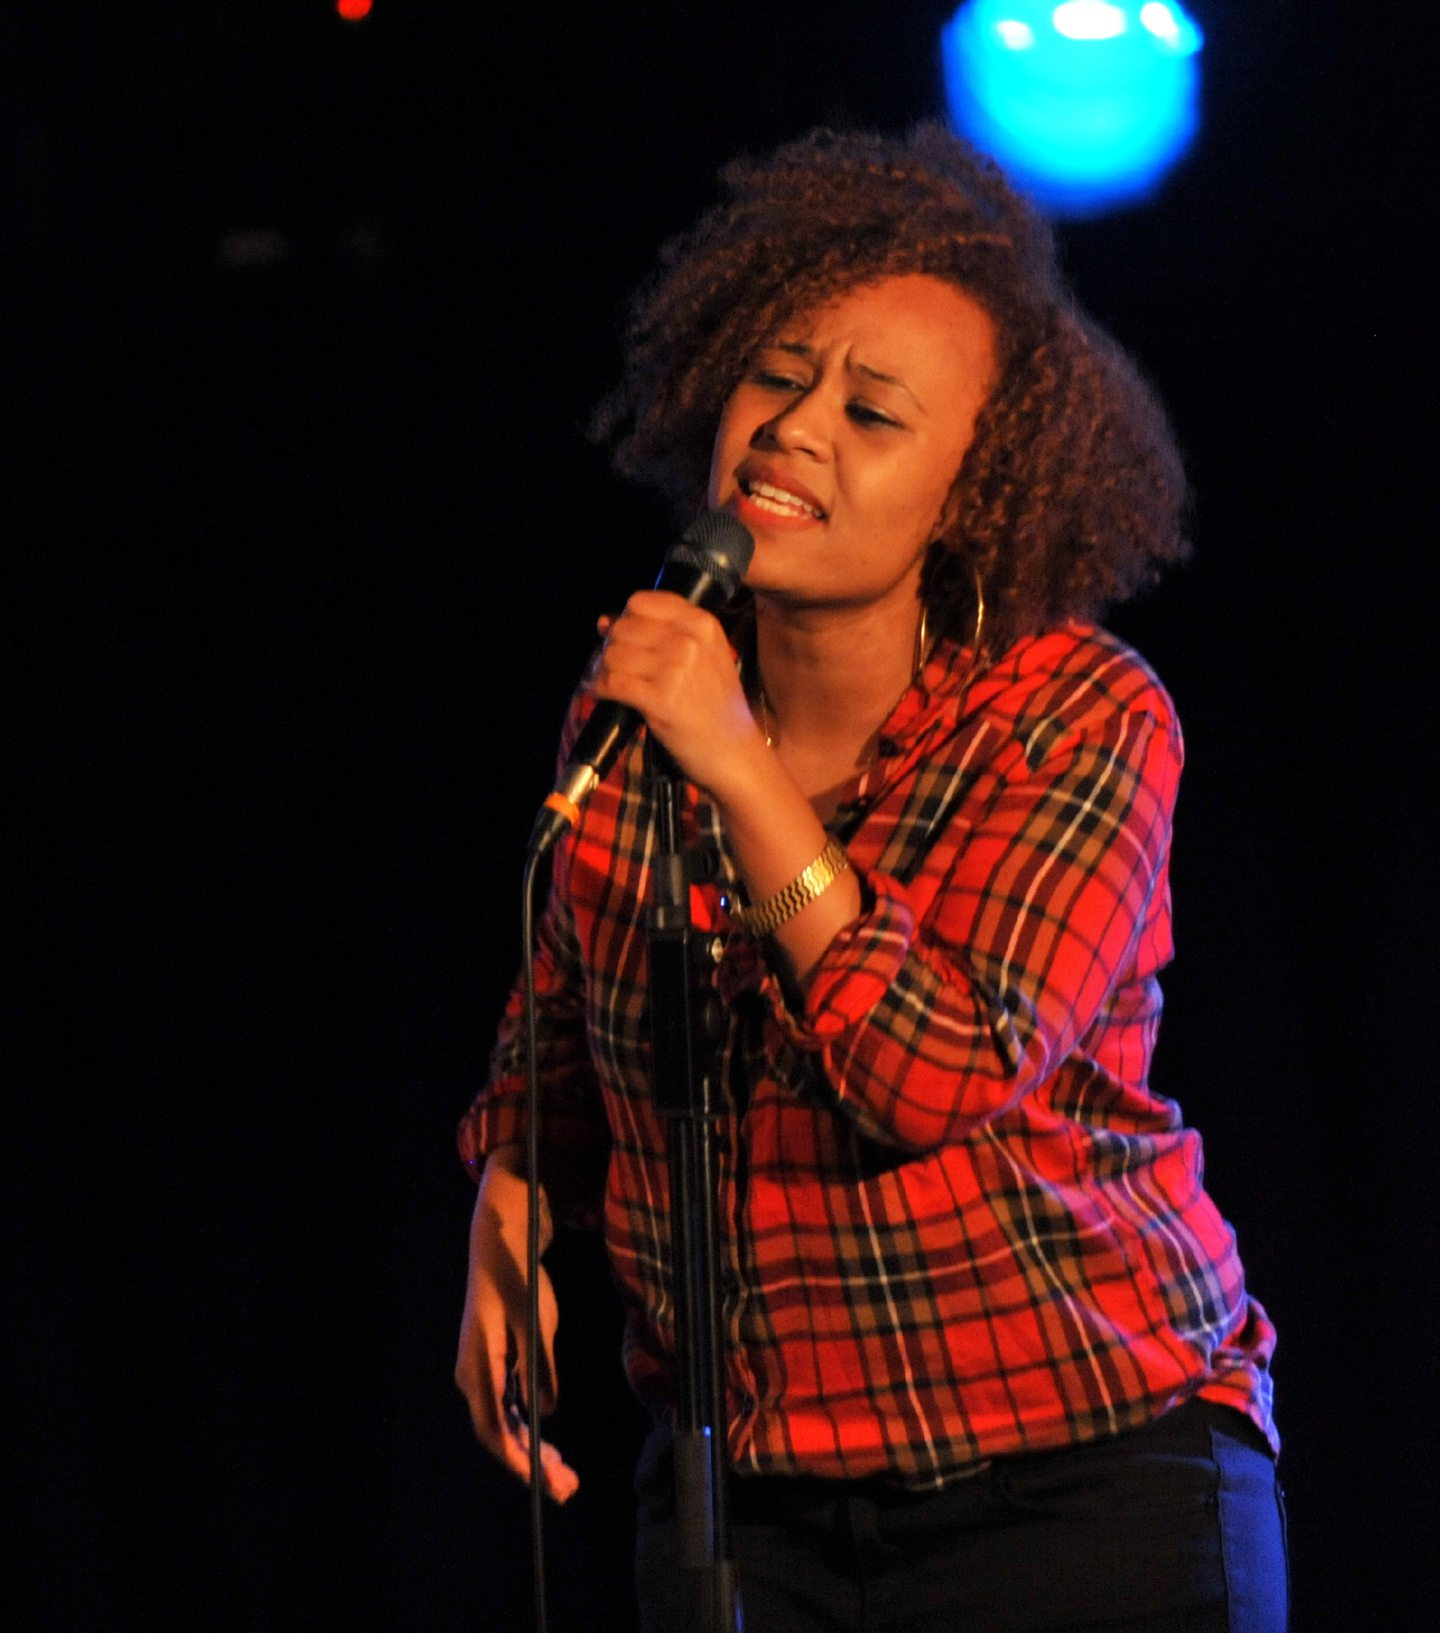 Emeli Sande impressed the audience at The Lemon Tree in 2010.